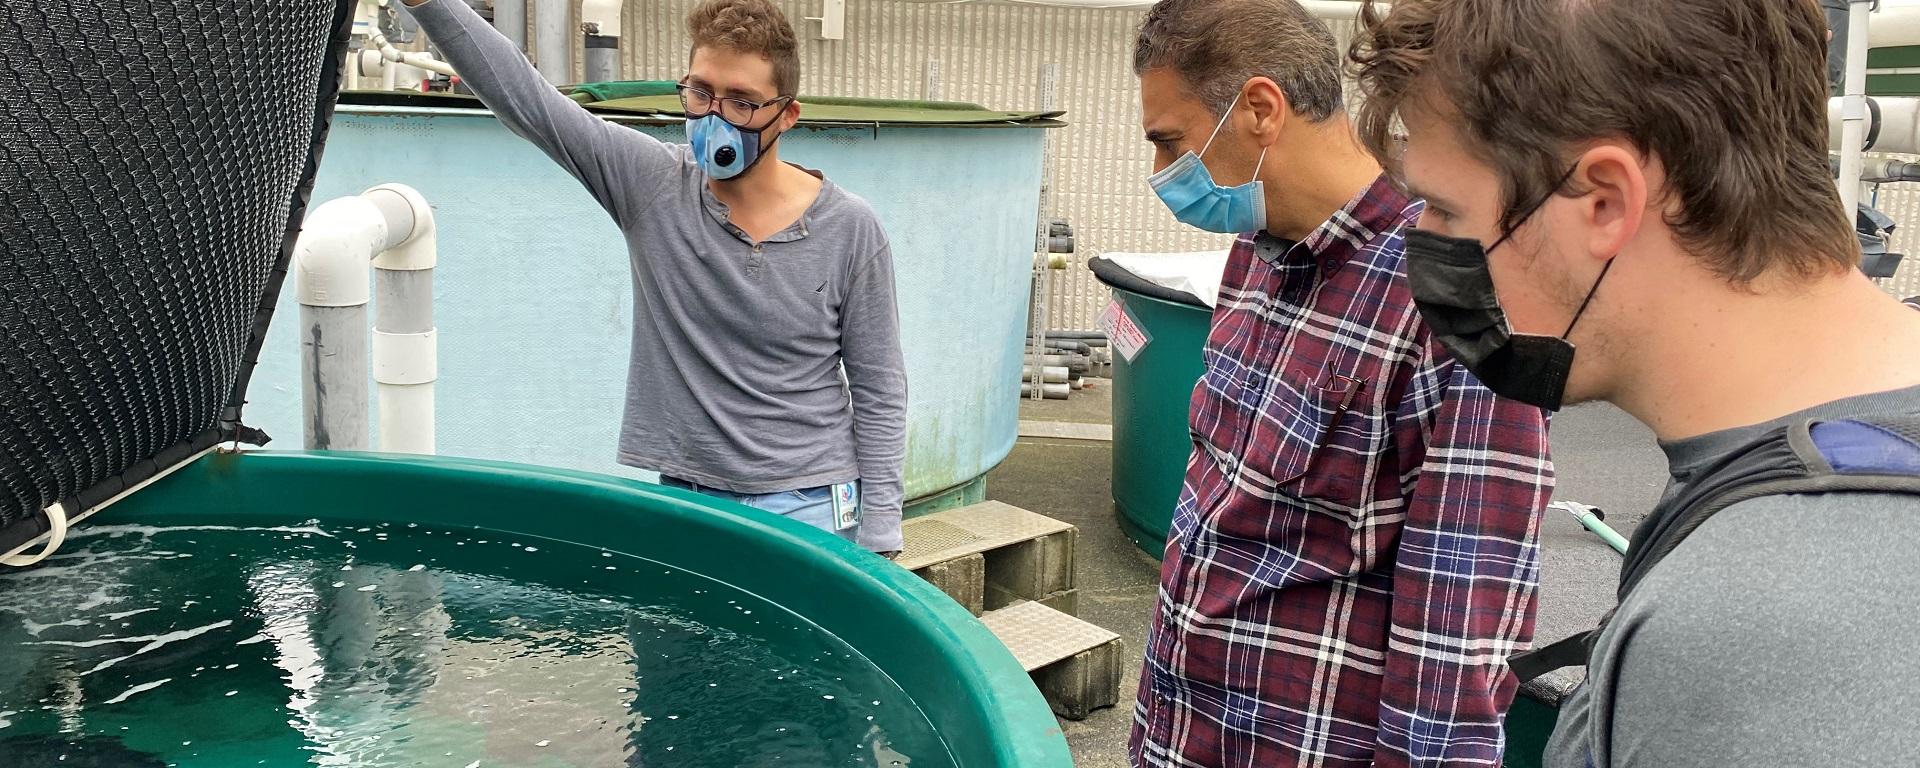 Aquaculture students on site visit